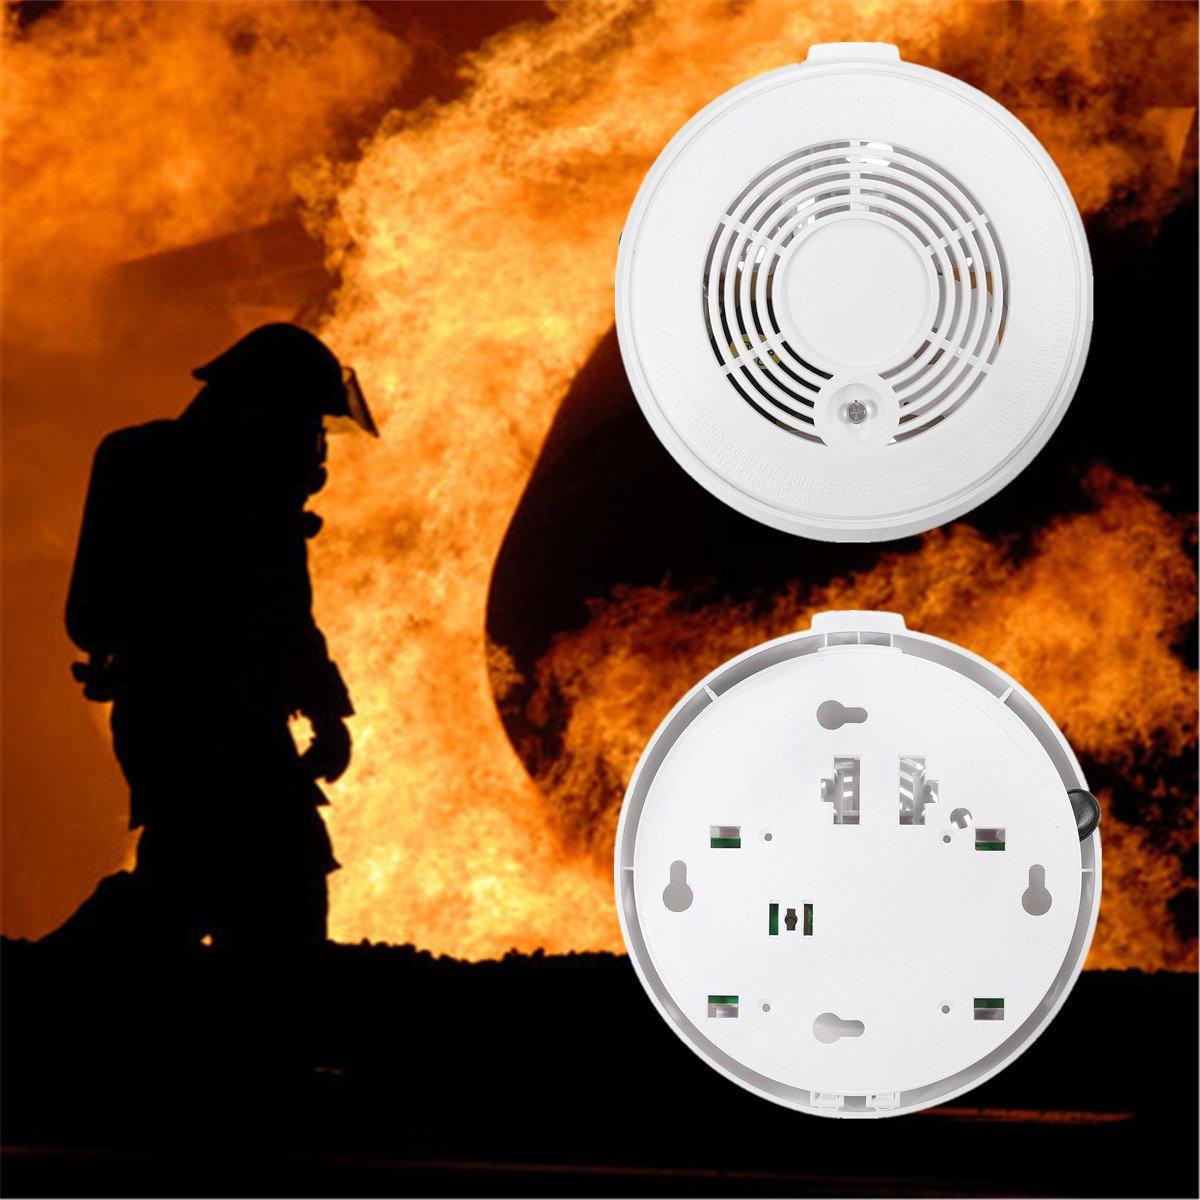 impianto-anticendio-casa-wireless